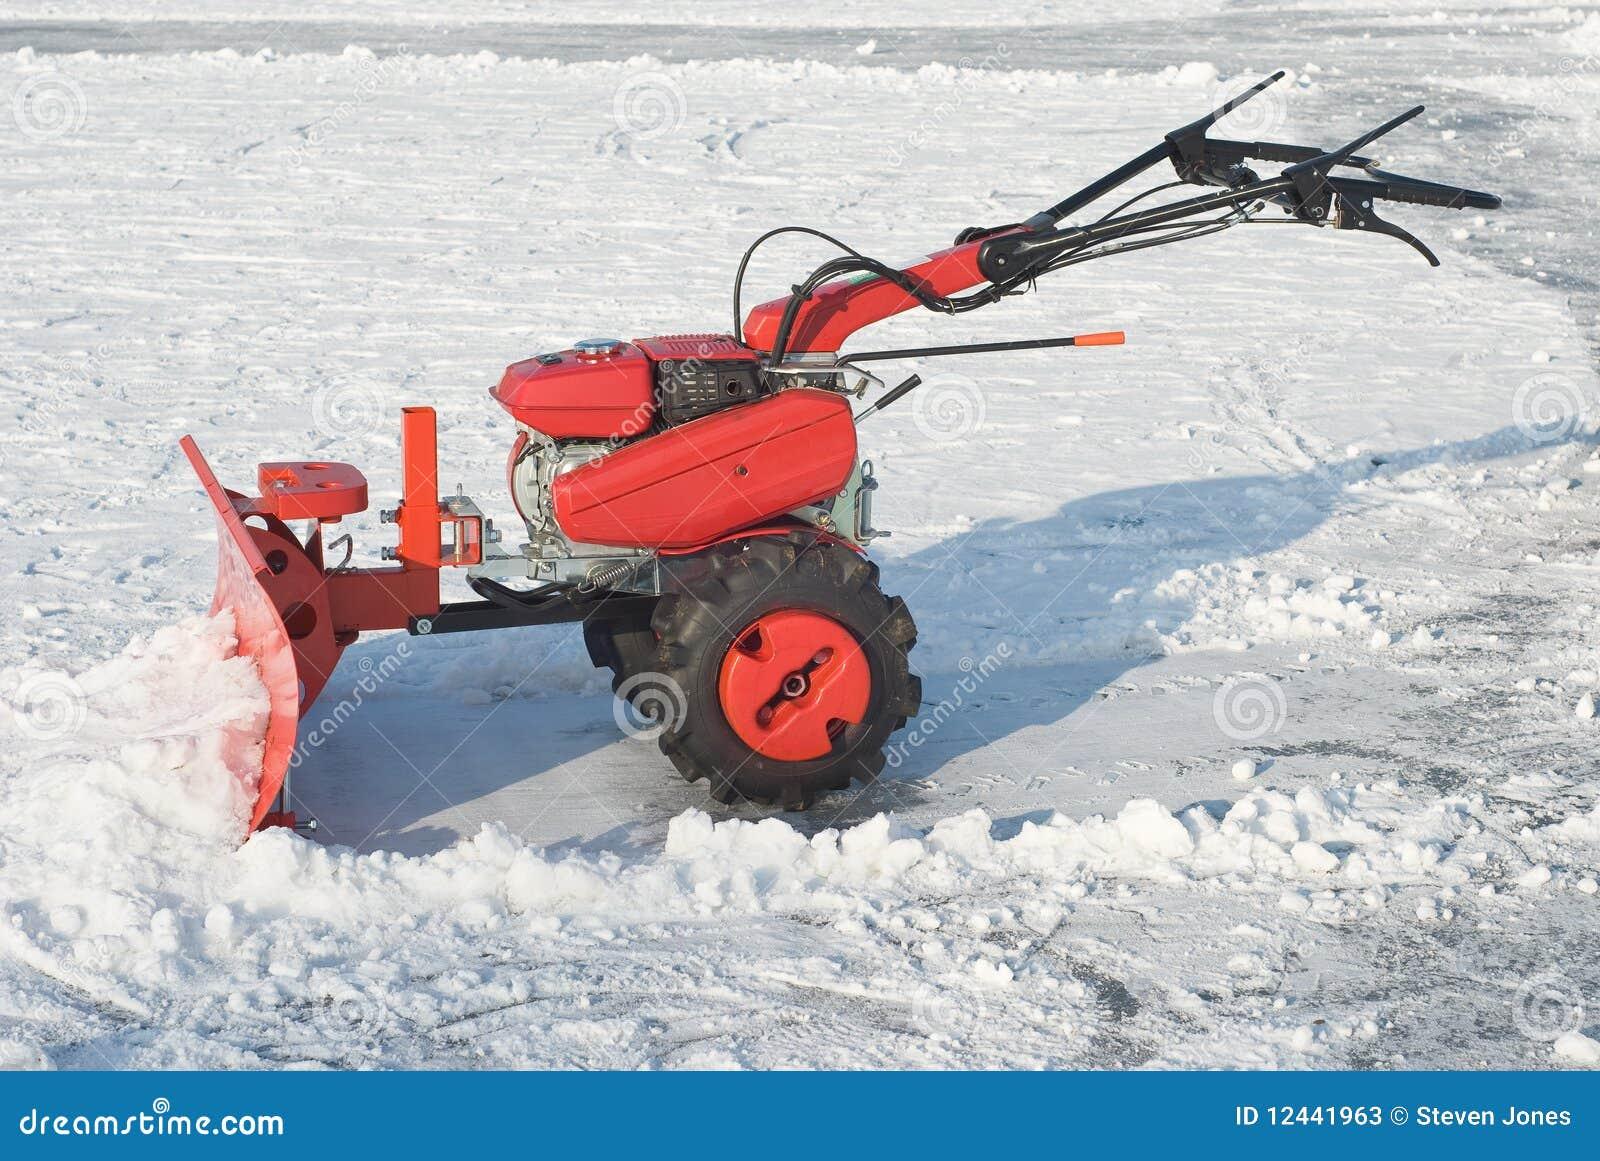 Snow Plow Prices >> Snow Removal Equipment Stock Photos - Image: 12441963